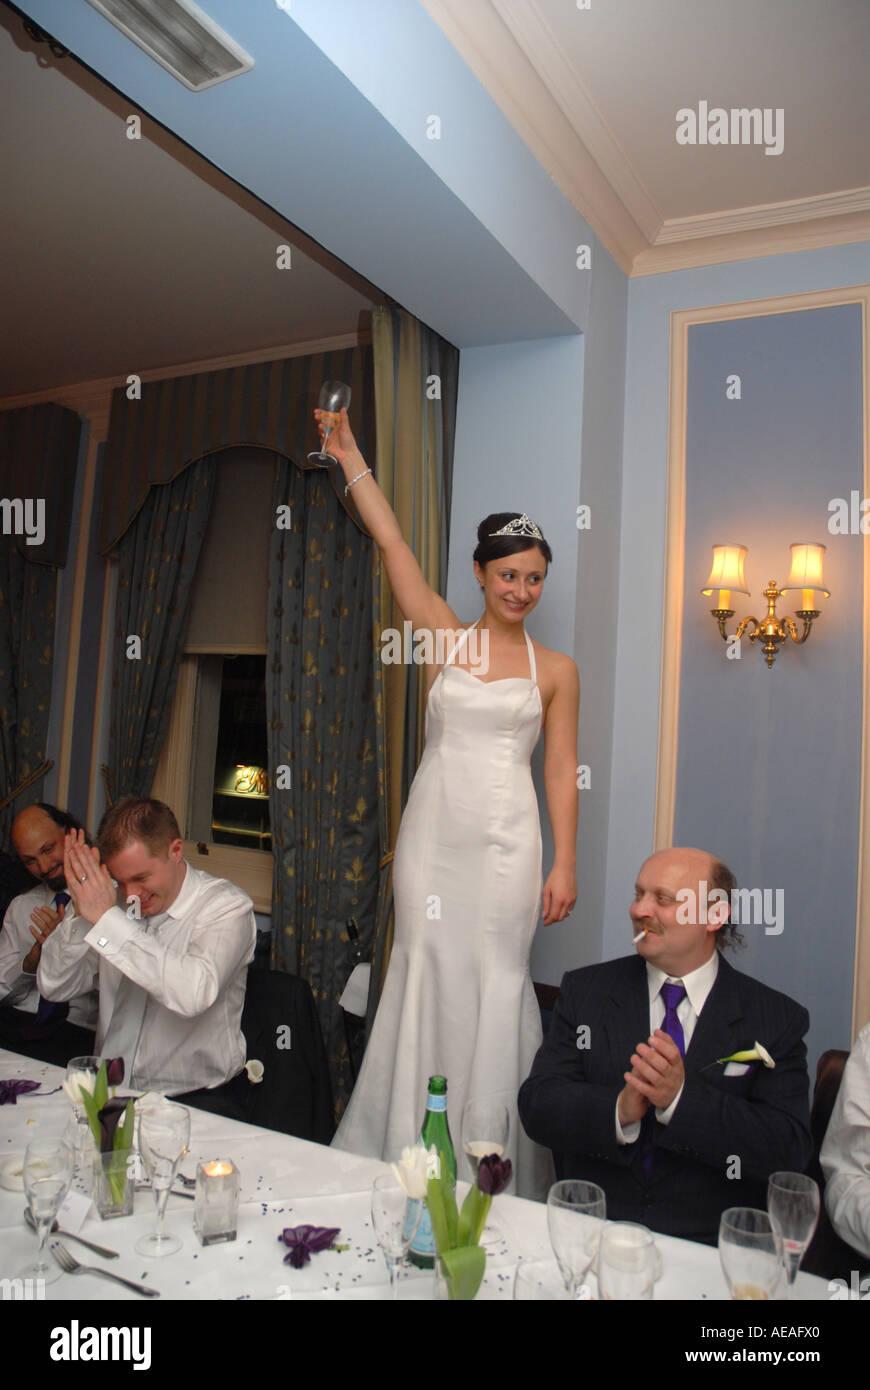 Bride Makes A Speech At Her Wedding Reception Kettners Restaurant Soho London